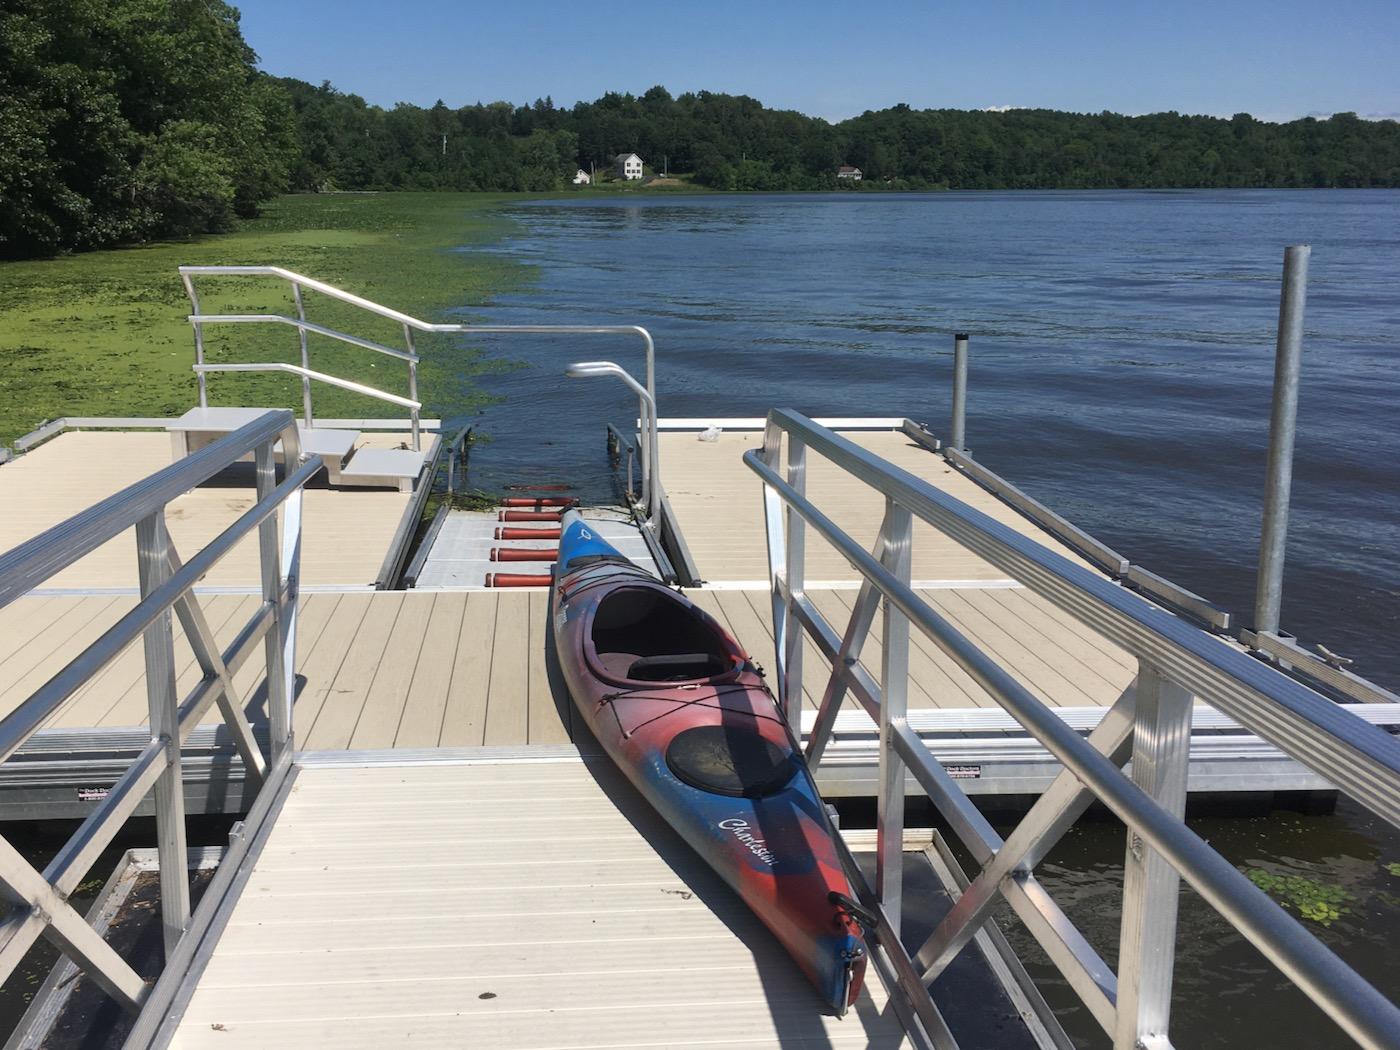 Mohawk River kayak launch